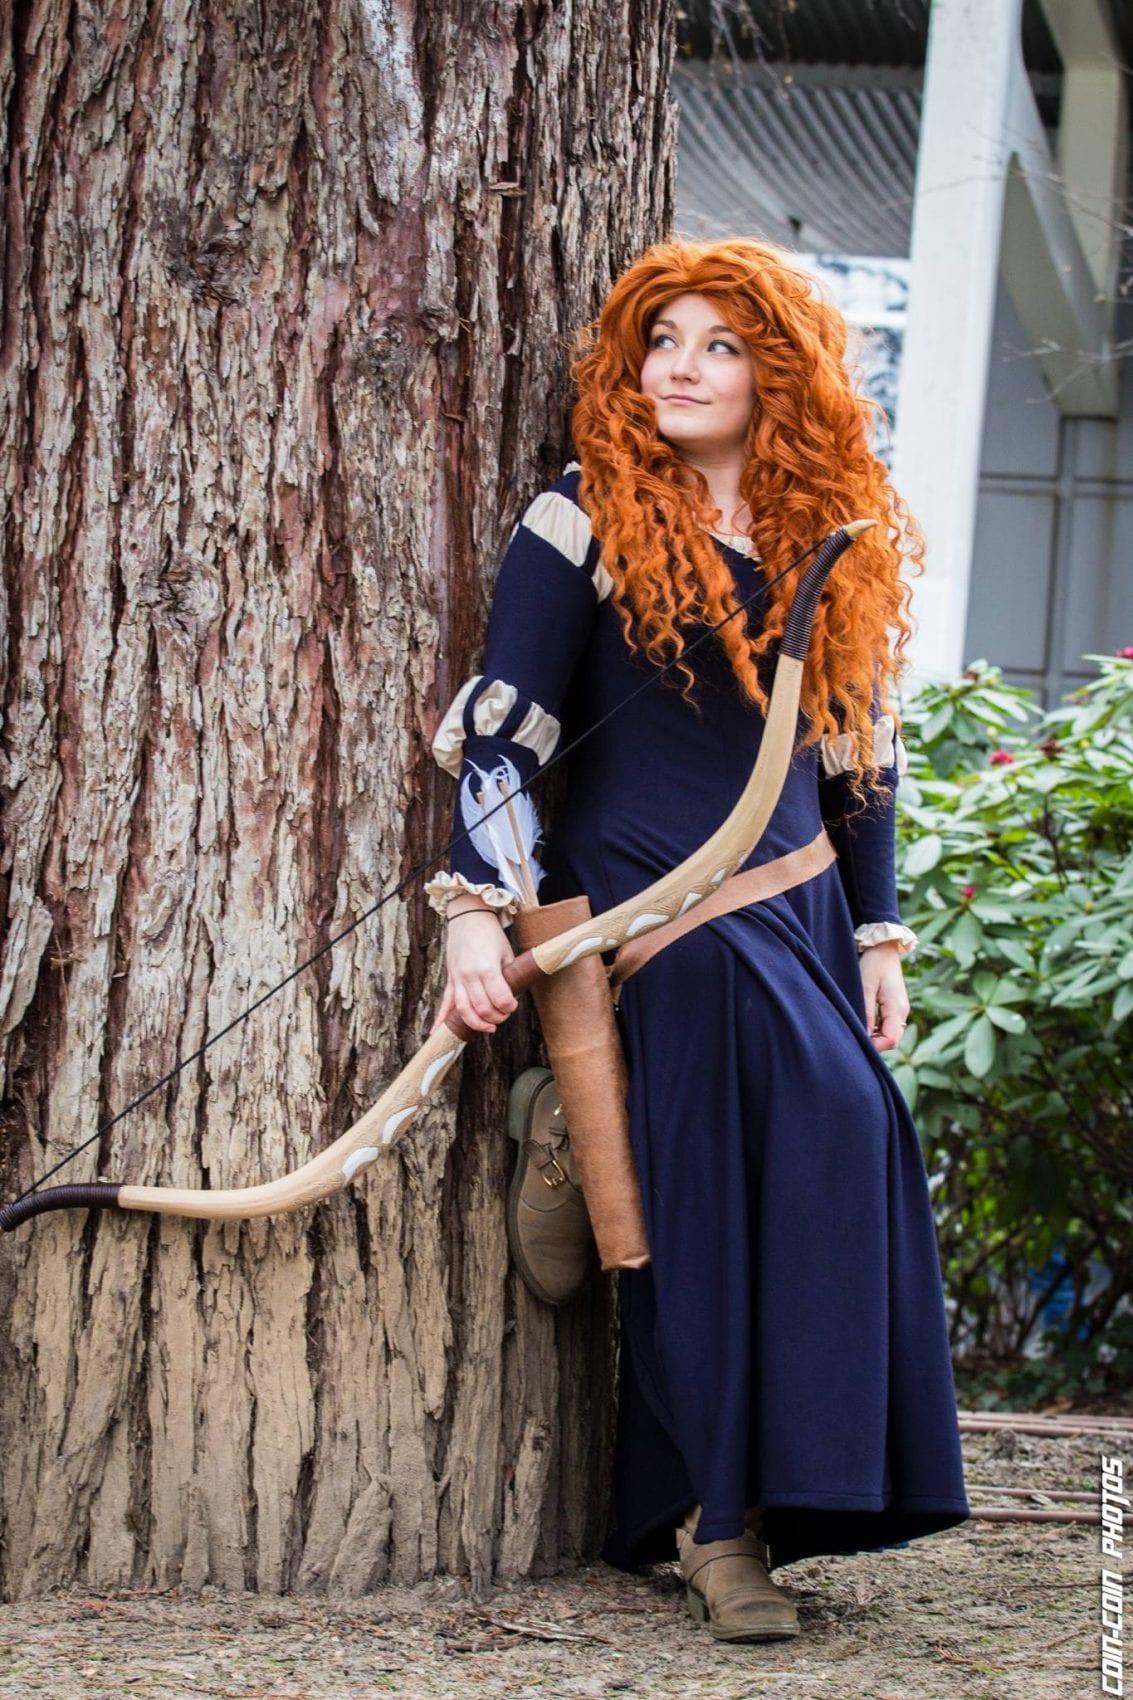 jessy-k-cosplay-interview-my-geek-actu4